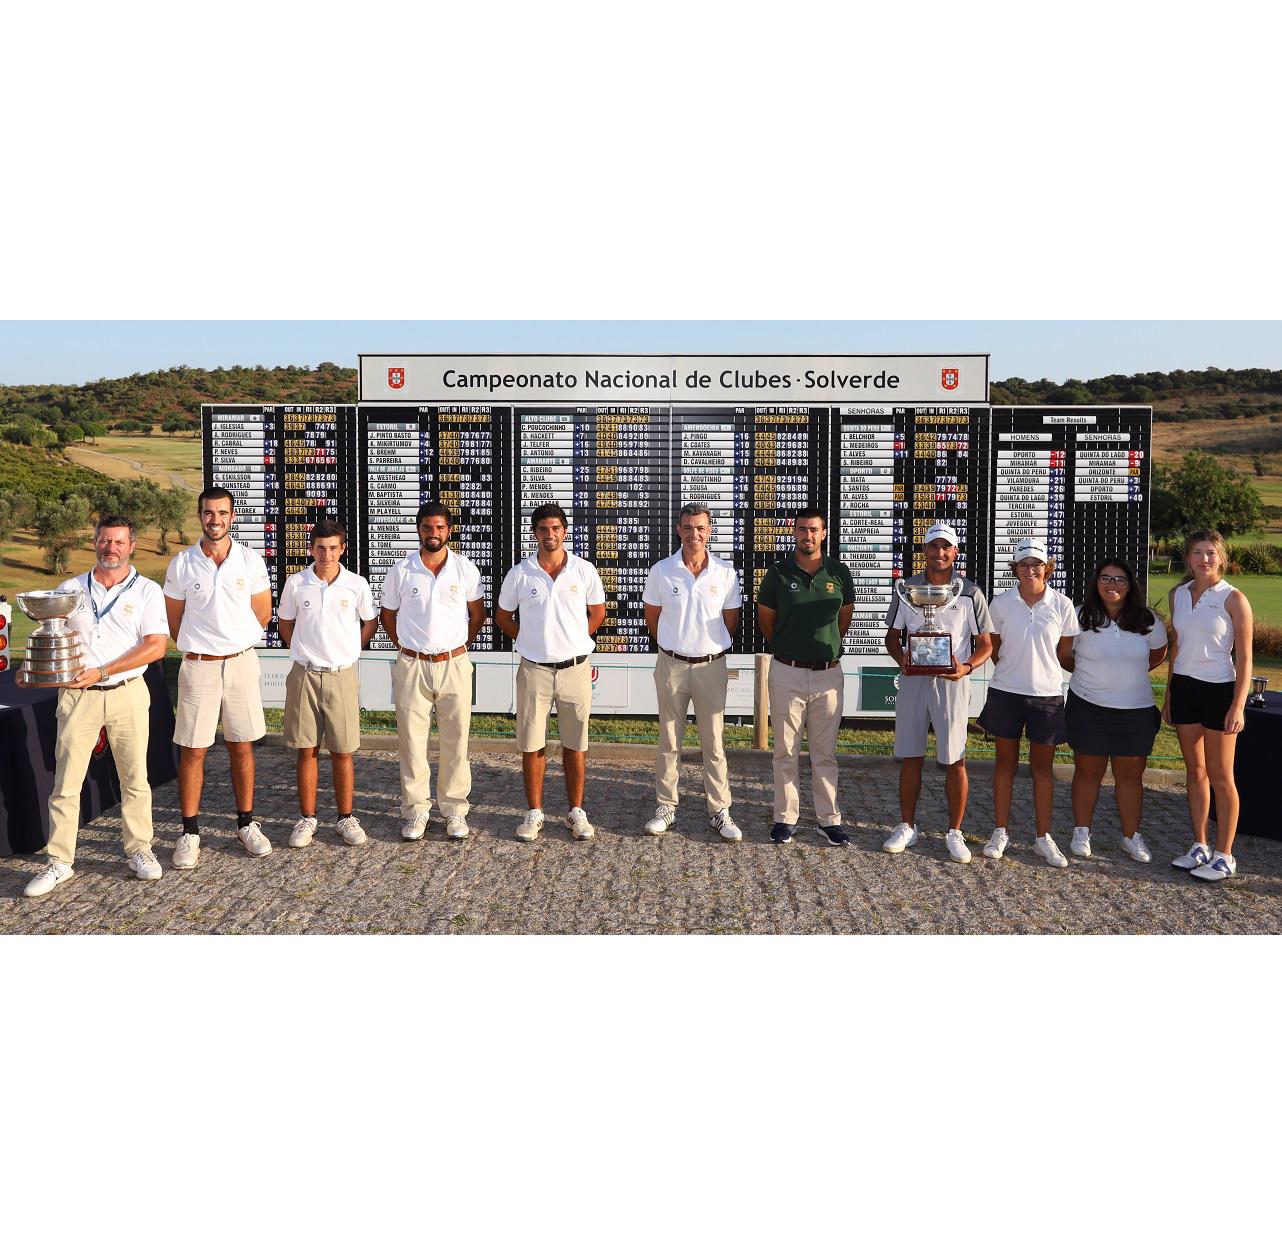 Campeonato Nacional de Clubes Solverde – Oporto GC sagra-se campeão Quinta do Lago estreia-se a vencer